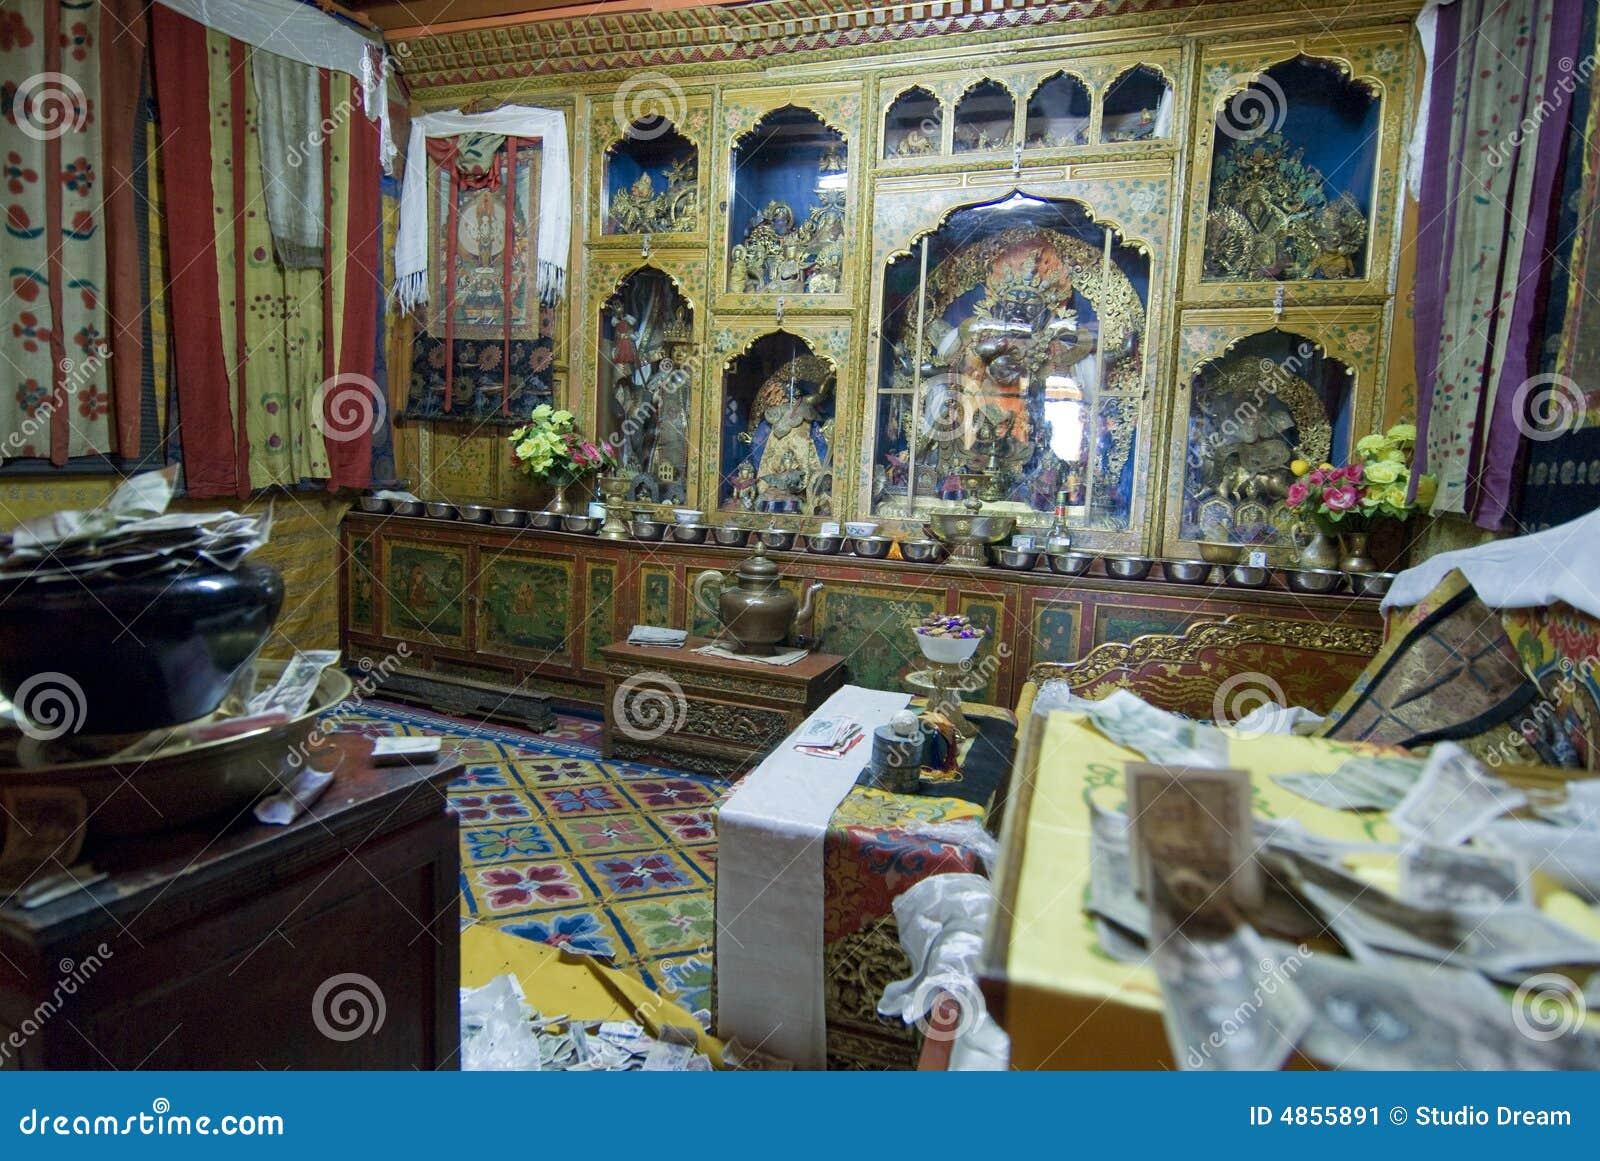 Dalai Lama Room Stock Image Image 4855891